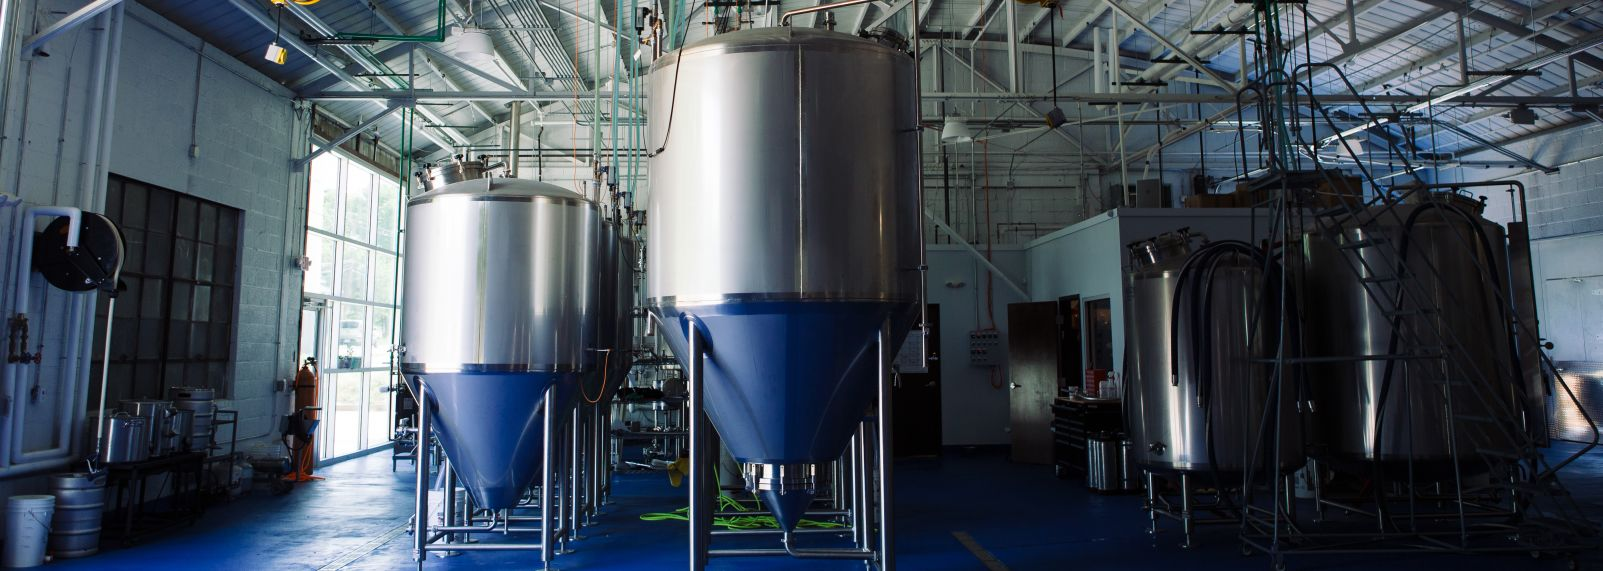 Brewery Bhavana